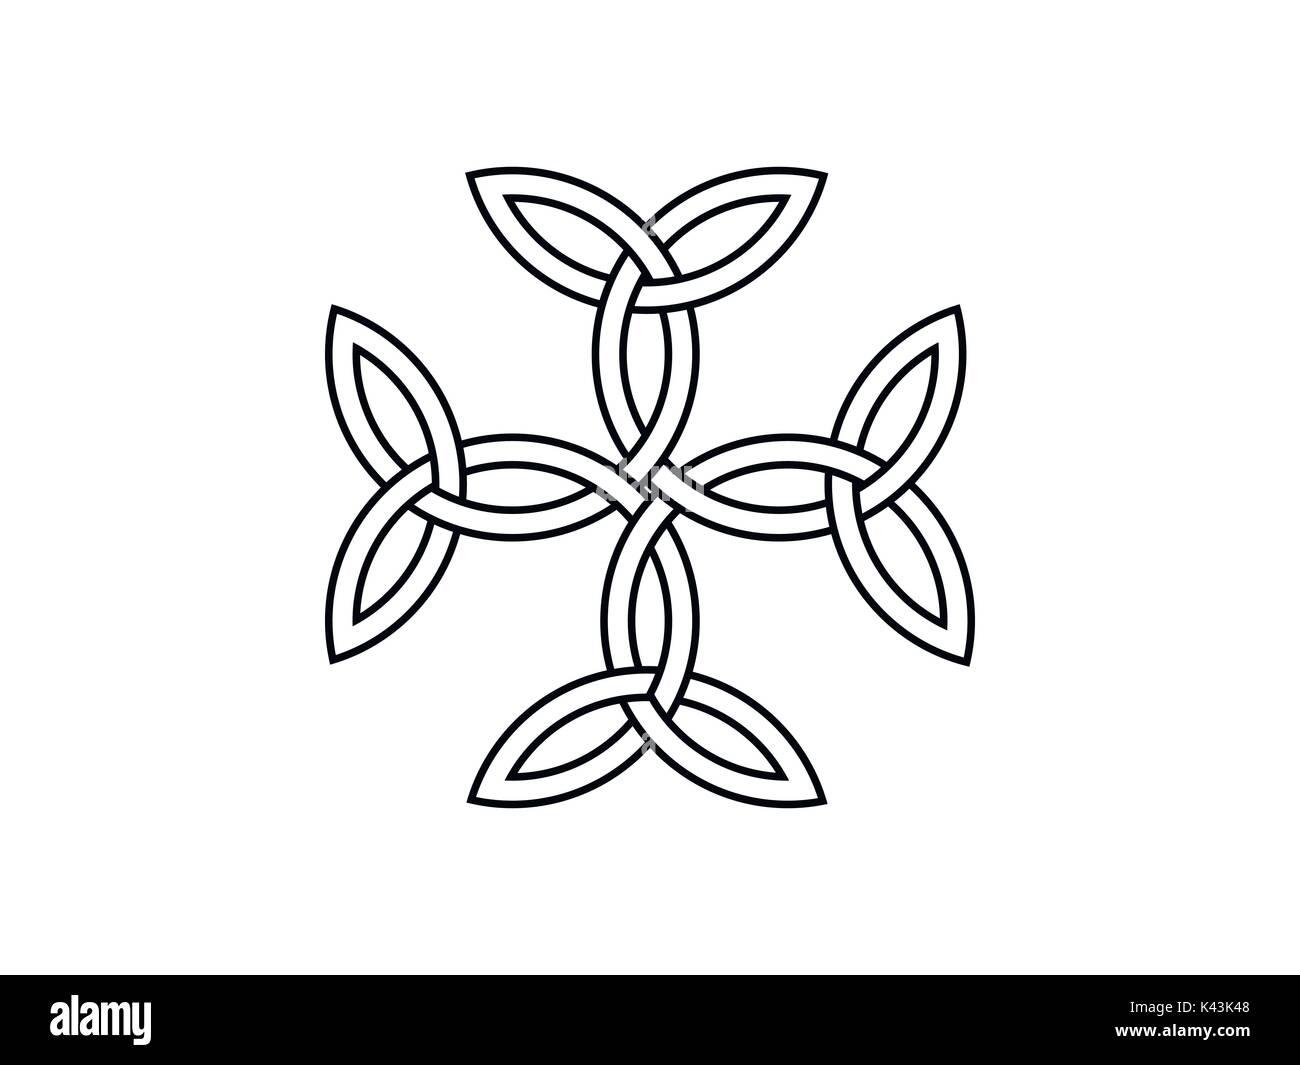 Cross tattoo symbol stock photos cross tattoo symbol stock triquetra symbol vector illustration stock image buycottarizona